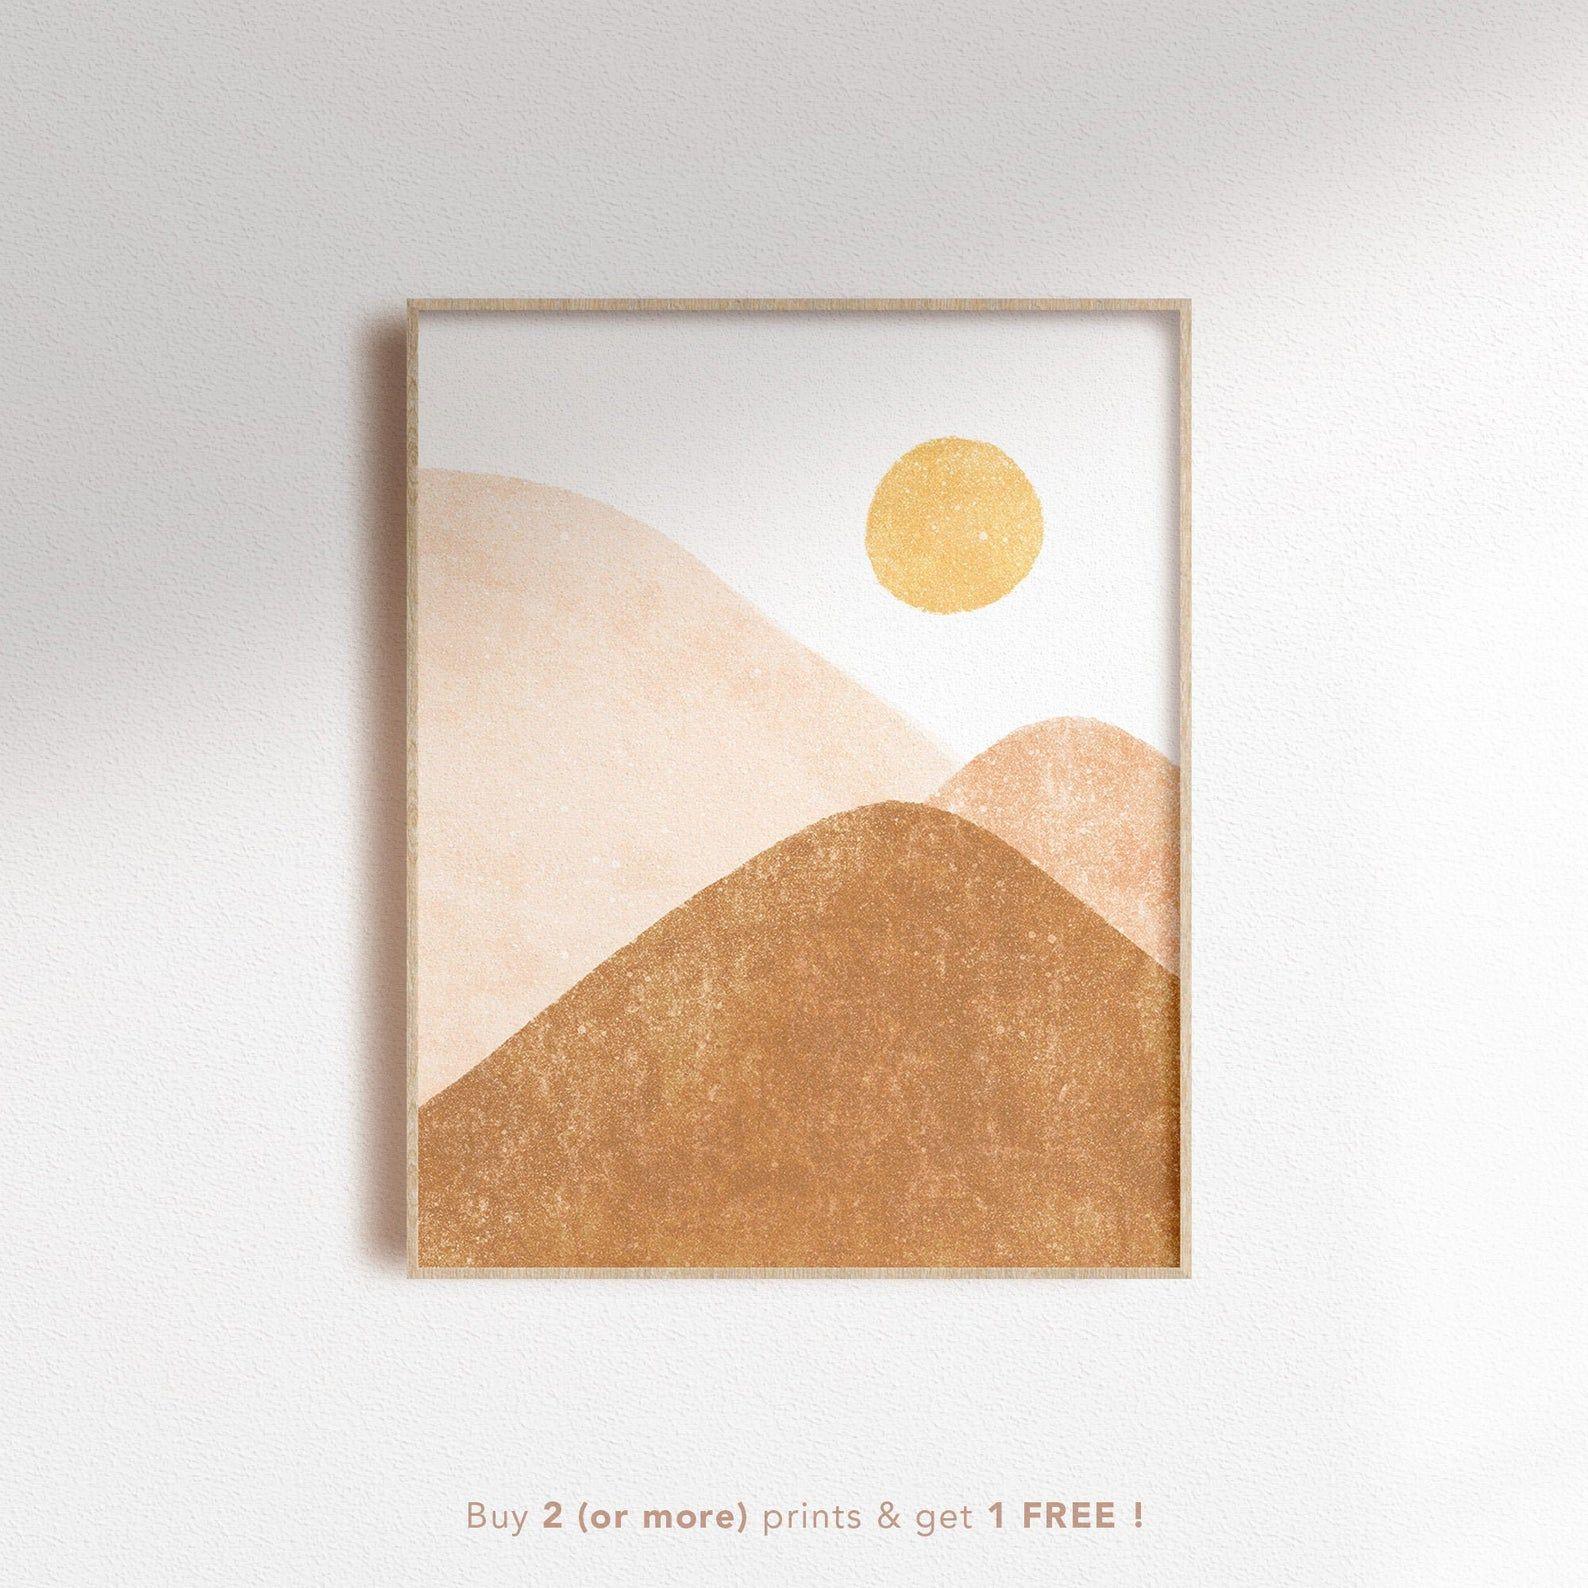 Neutral Sunshine Scenery Digital Art Print Boho Mountain Sun Etsy In 2020 Digital Art Prints Art Prints Digital Wall Art